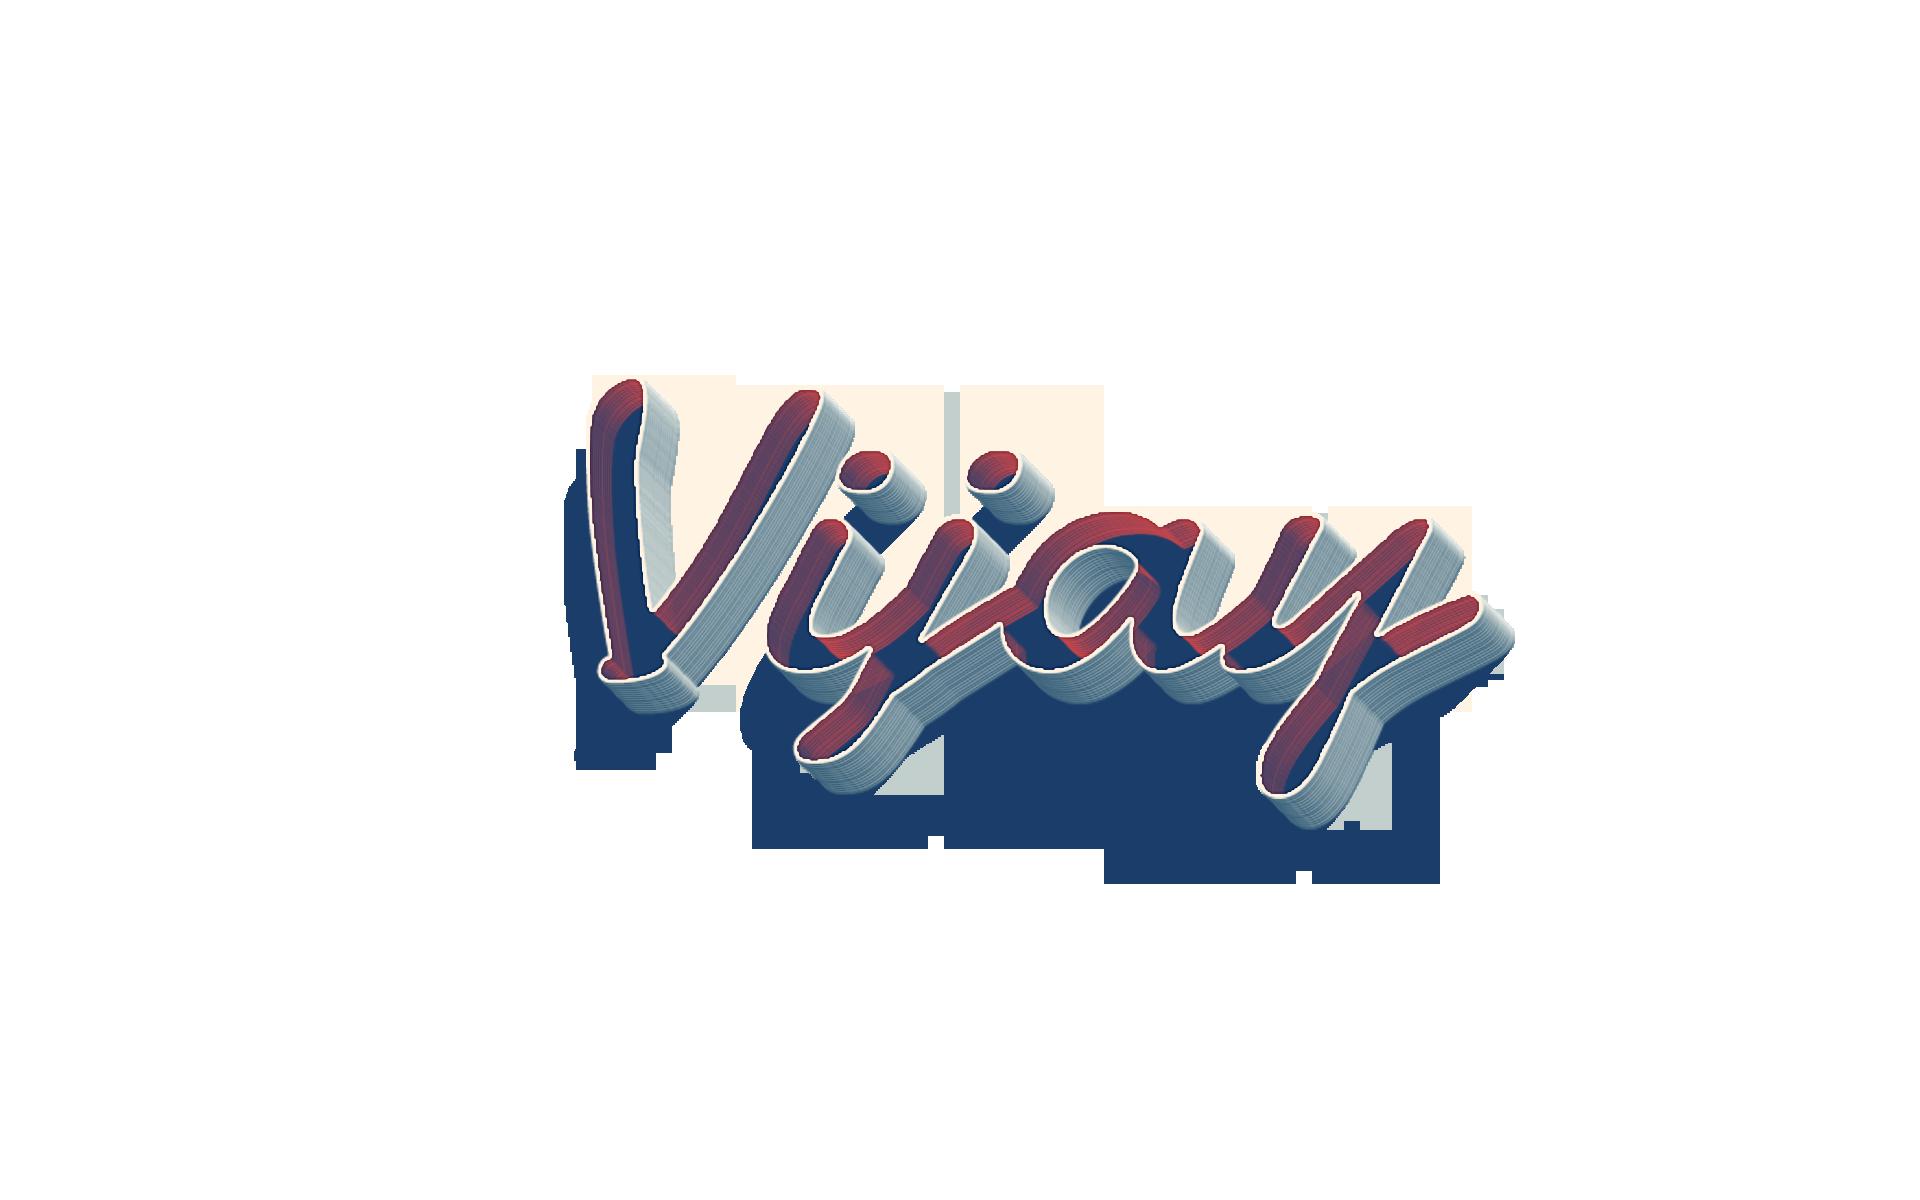 Vijay Name Wallpaper Hd Vijay Name Image 3d Free Wallpaper